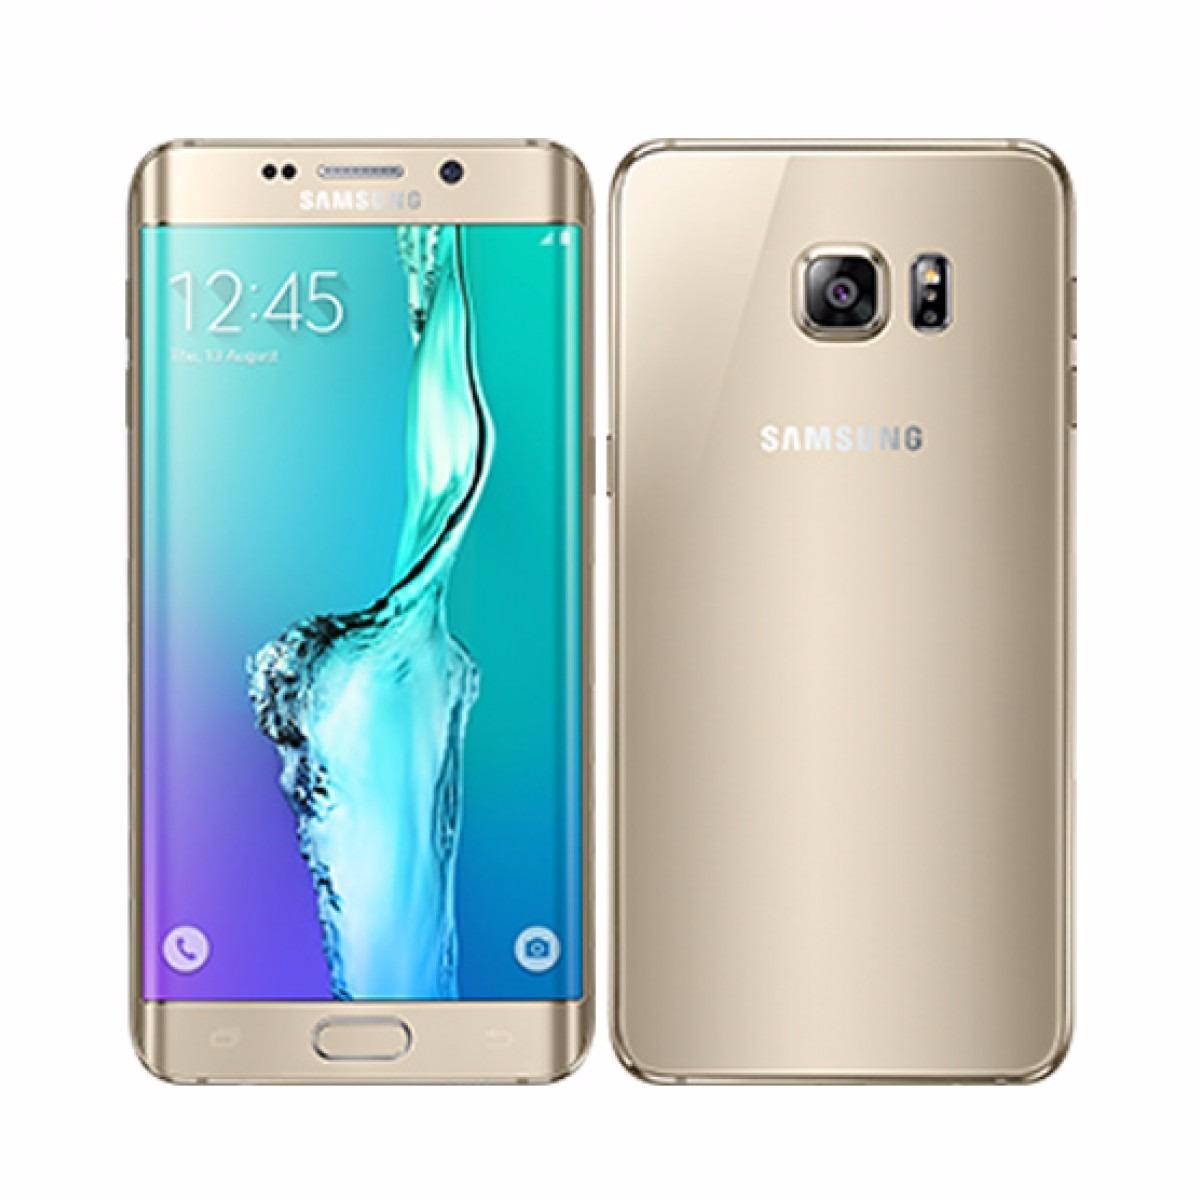 Smartphone samsung galaxy s6 edge 32g 925i nf vitrine r 170100 carregando zoom stopboris Image collections